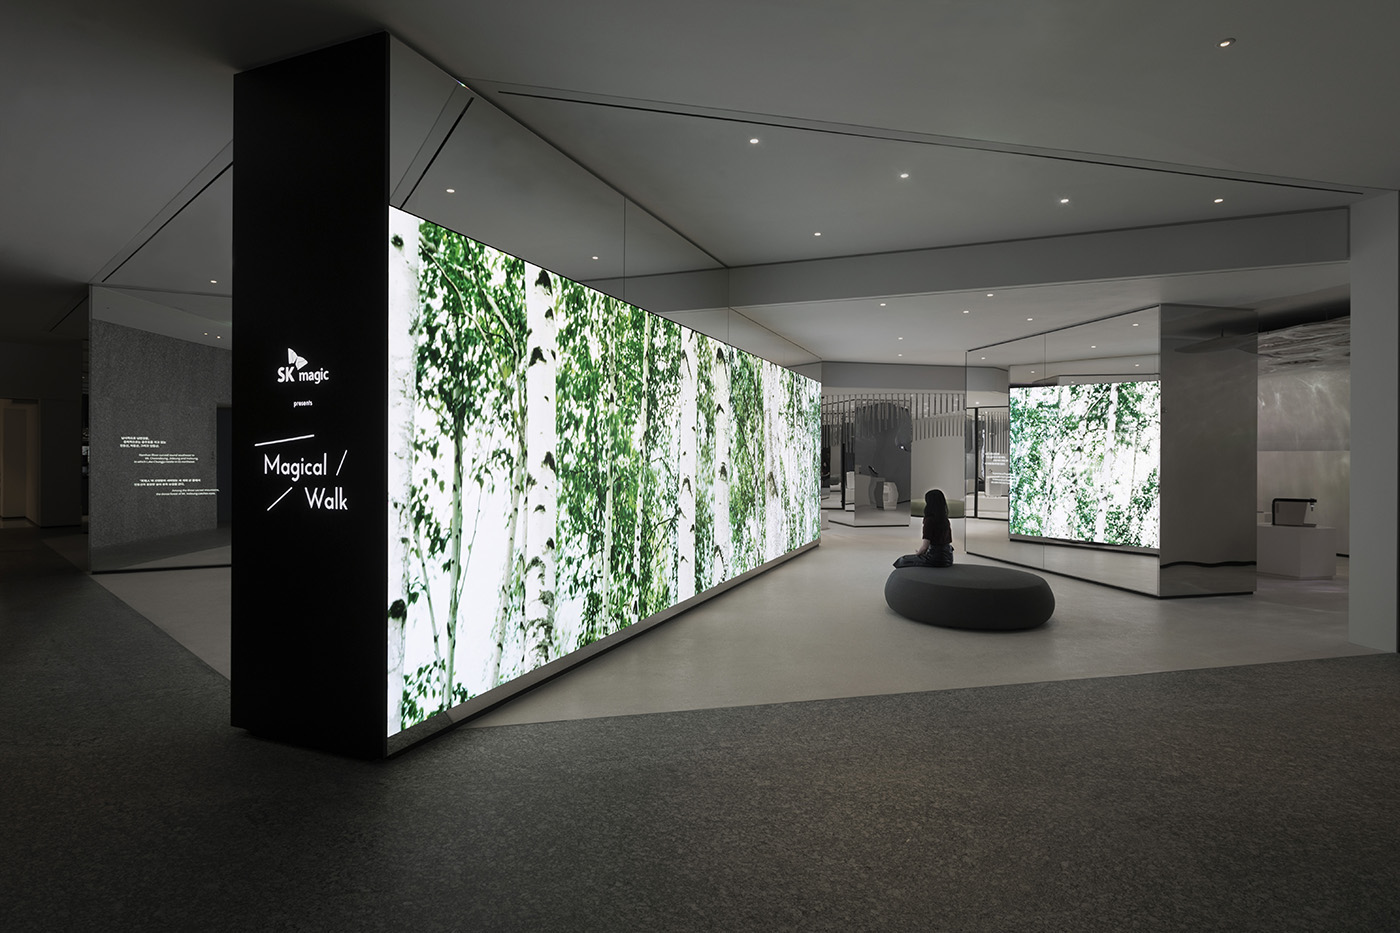 sk magic brand gallery magical walk seoul korea on behance. Black Bedroom Furniture Sets. Home Design Ideas